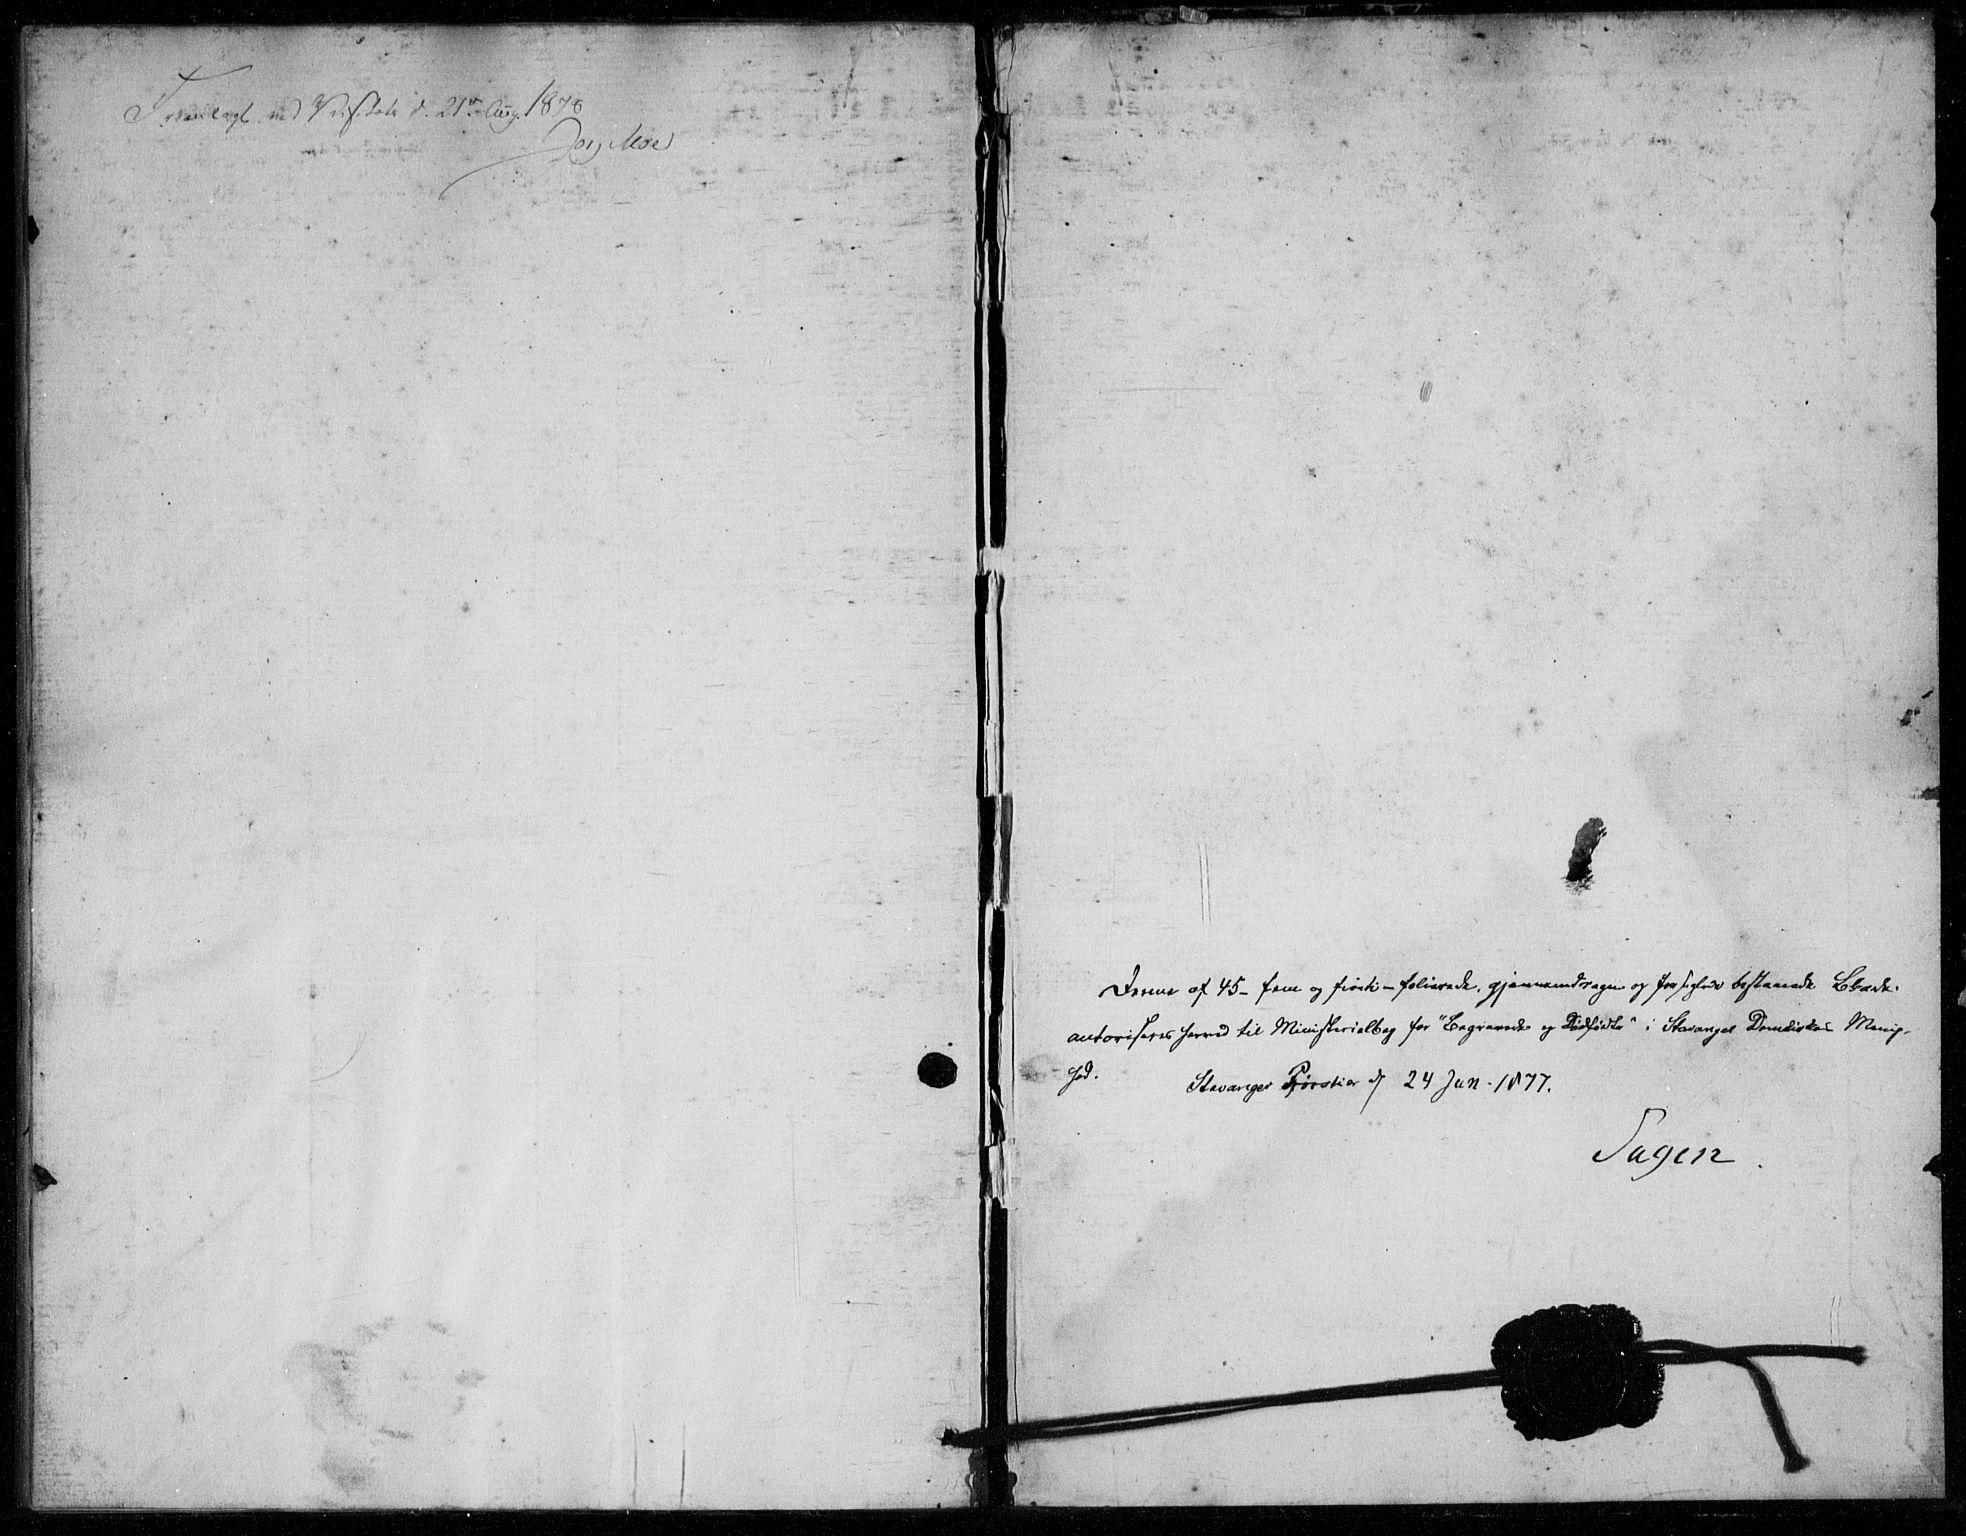 SAST, Domkirken sokneprestkontor, 30/30BA/L0024: Ministerialbok nr. A 23, 1877-1877